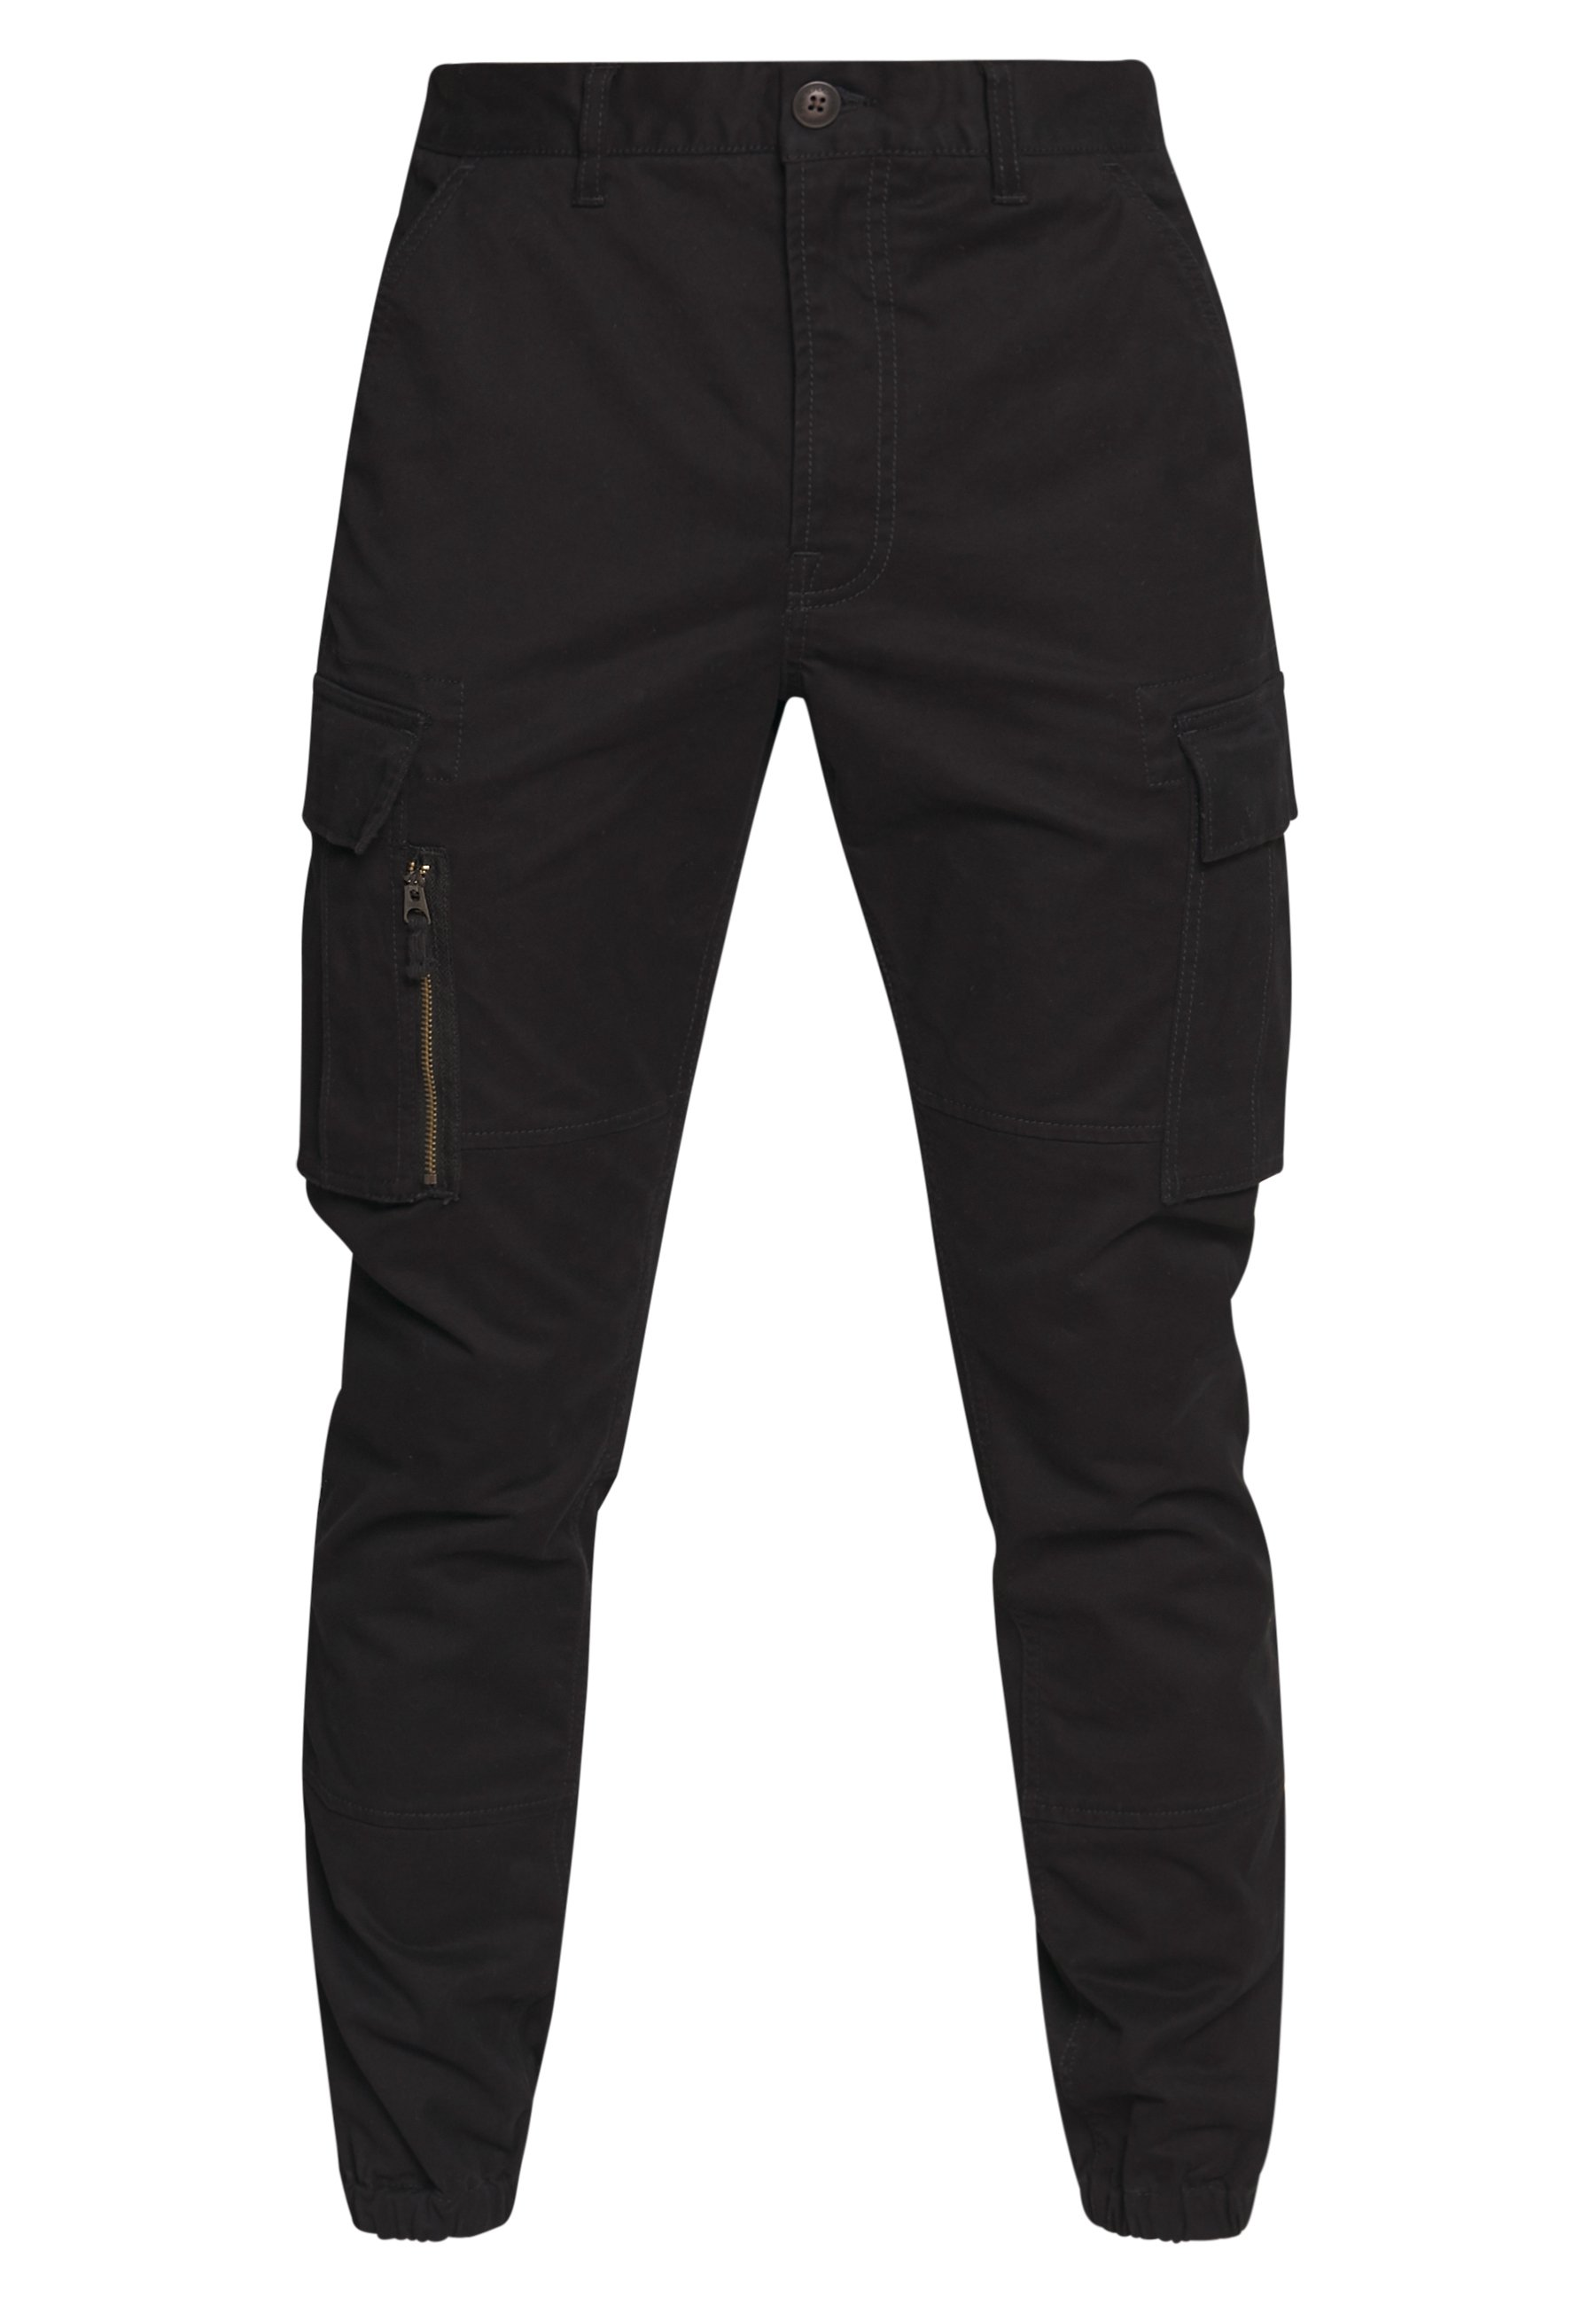 Superdry RECRUIT FLIGHT GRIP CARGO - Pantalon cargo - black